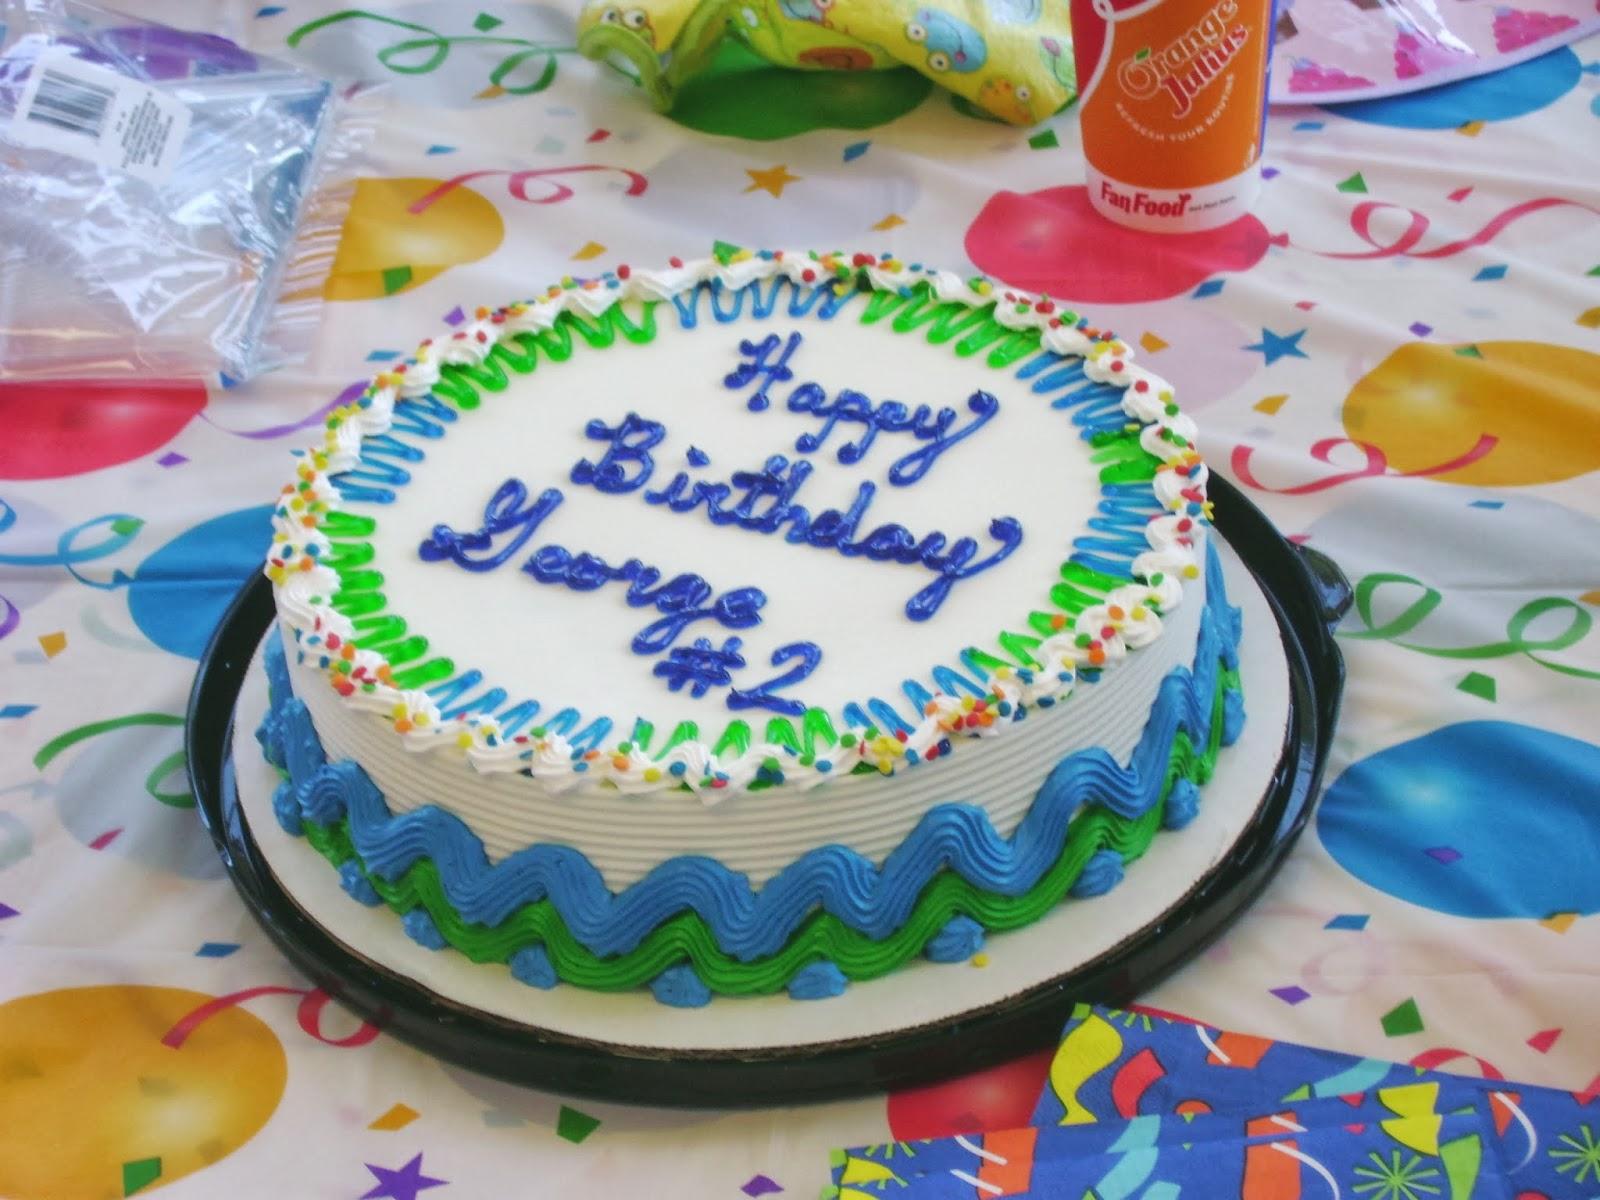 Hiswayserves Happy Birthday George